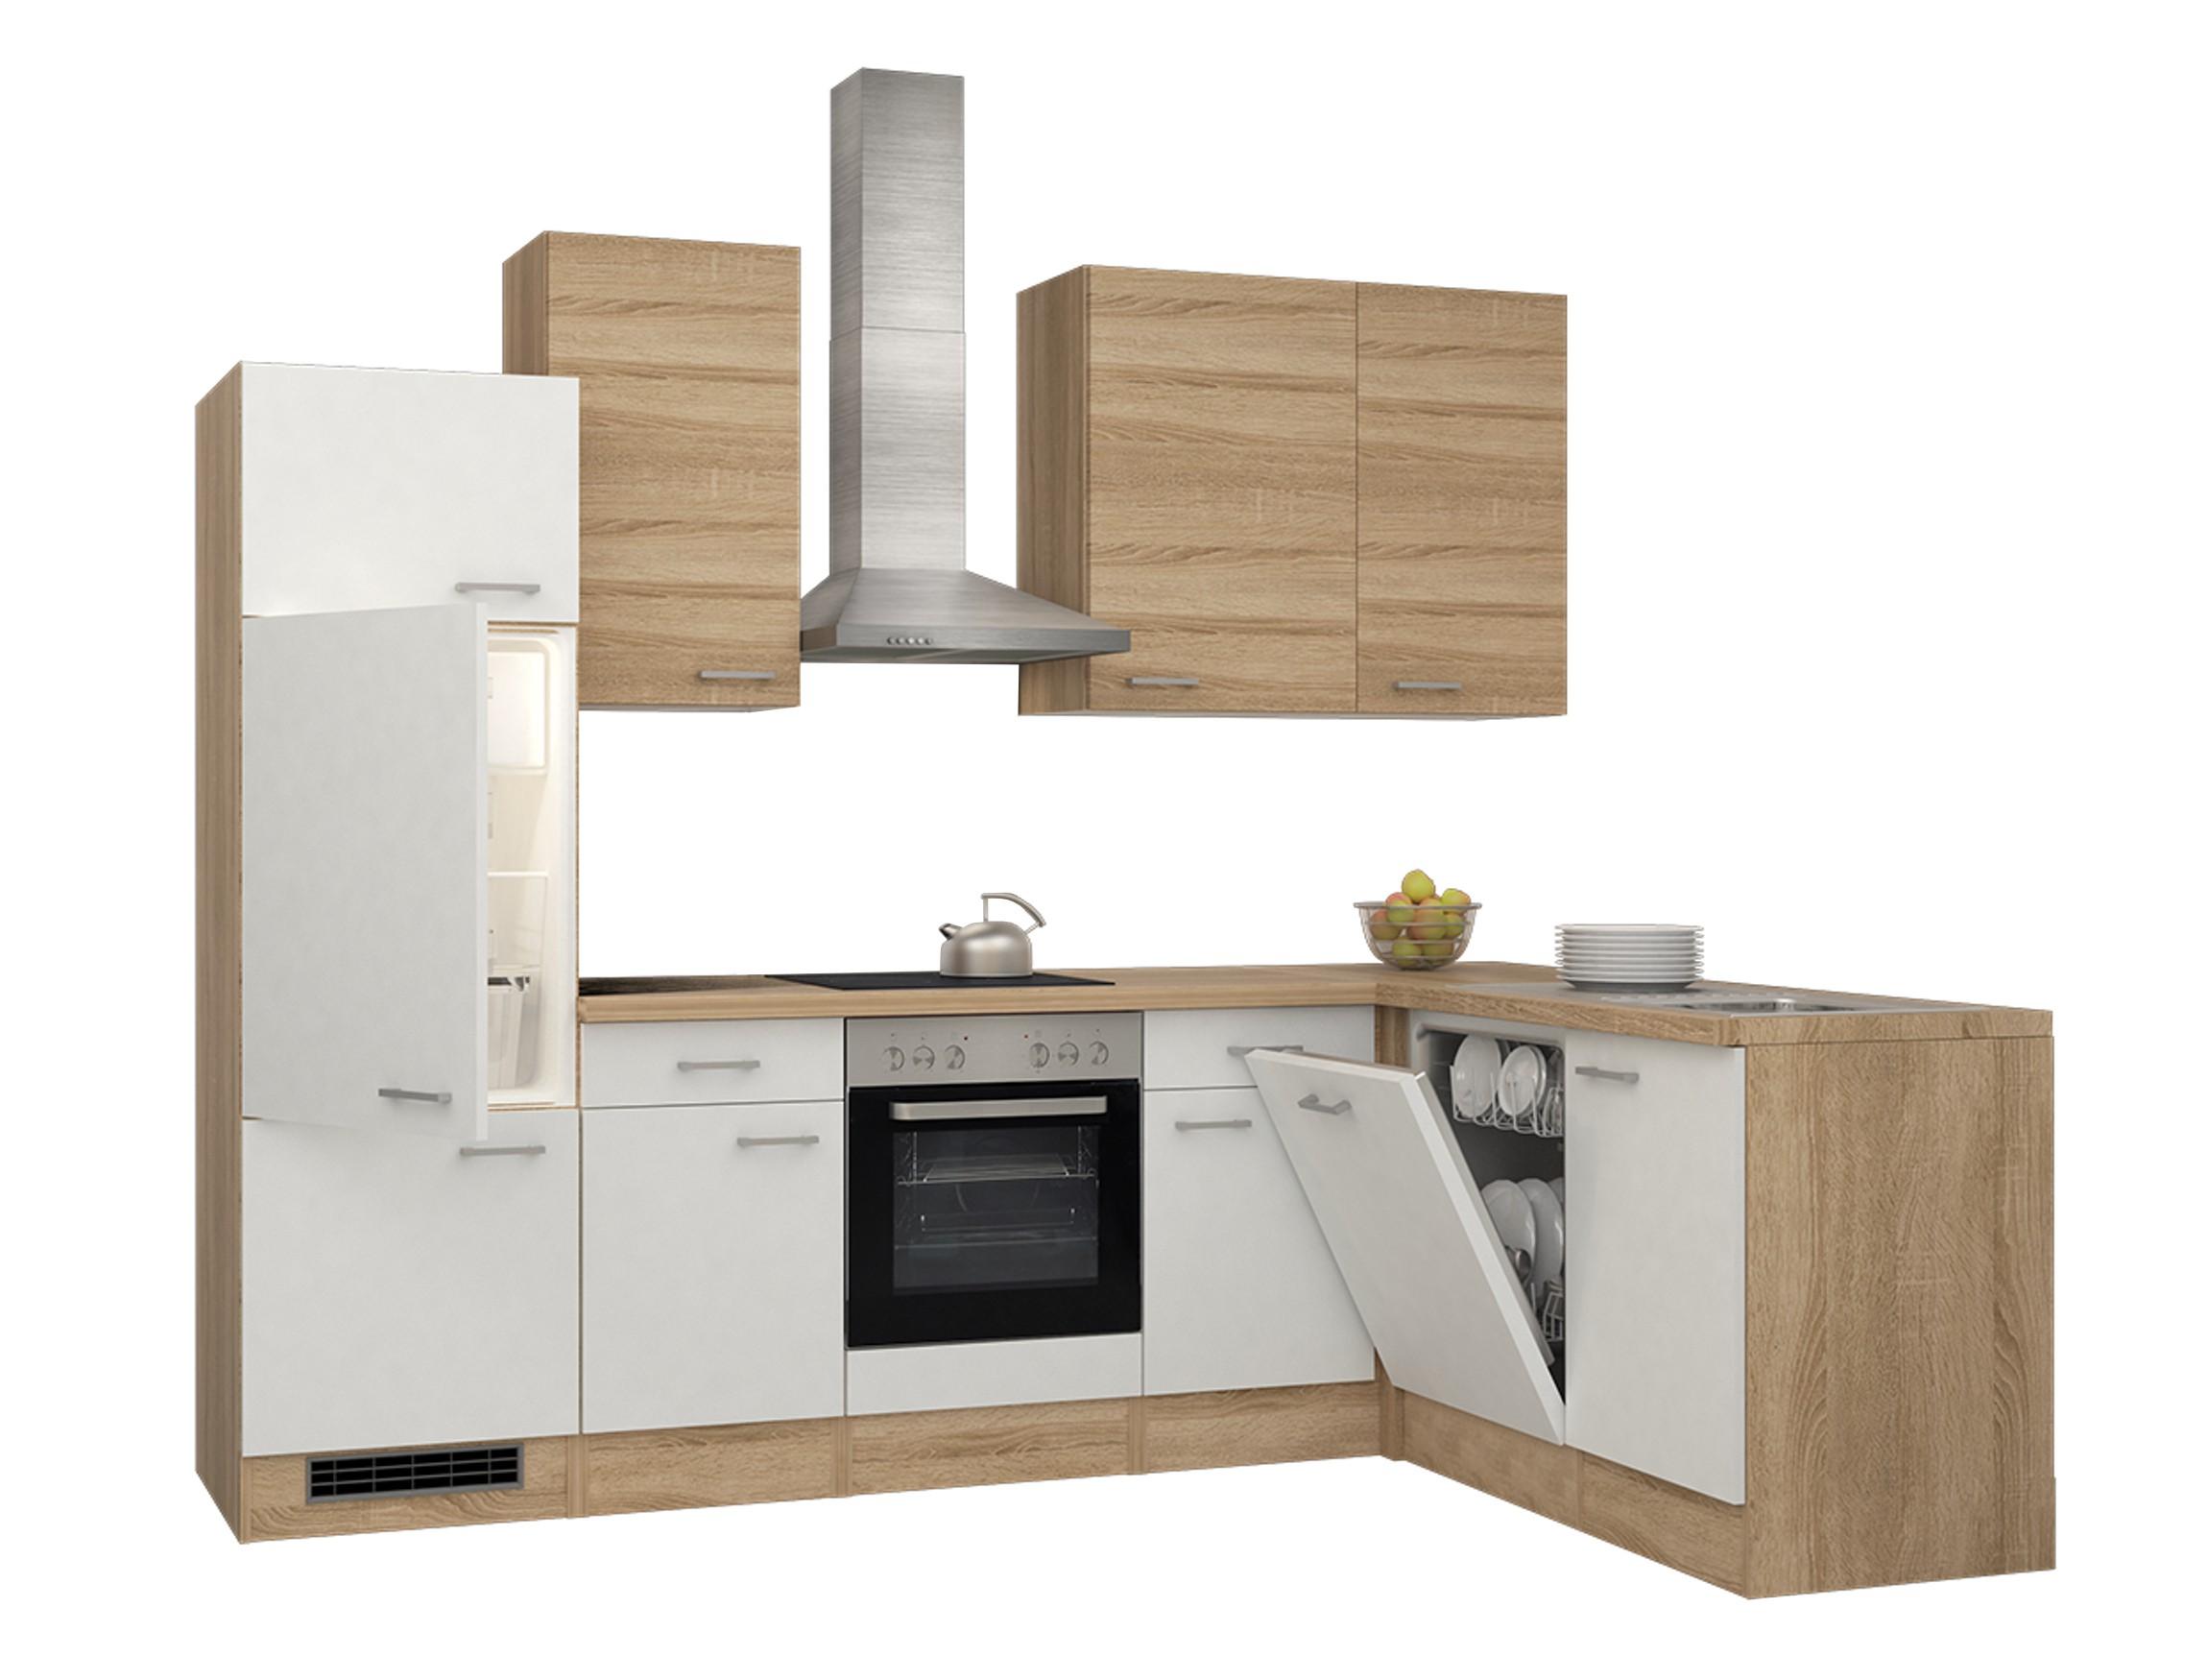 eckk che rom k che mit e ger ten breite 280 x 170 cm wei k che k chenzeilen. Black Bedroom Furniture Sets. Home Design Ideas